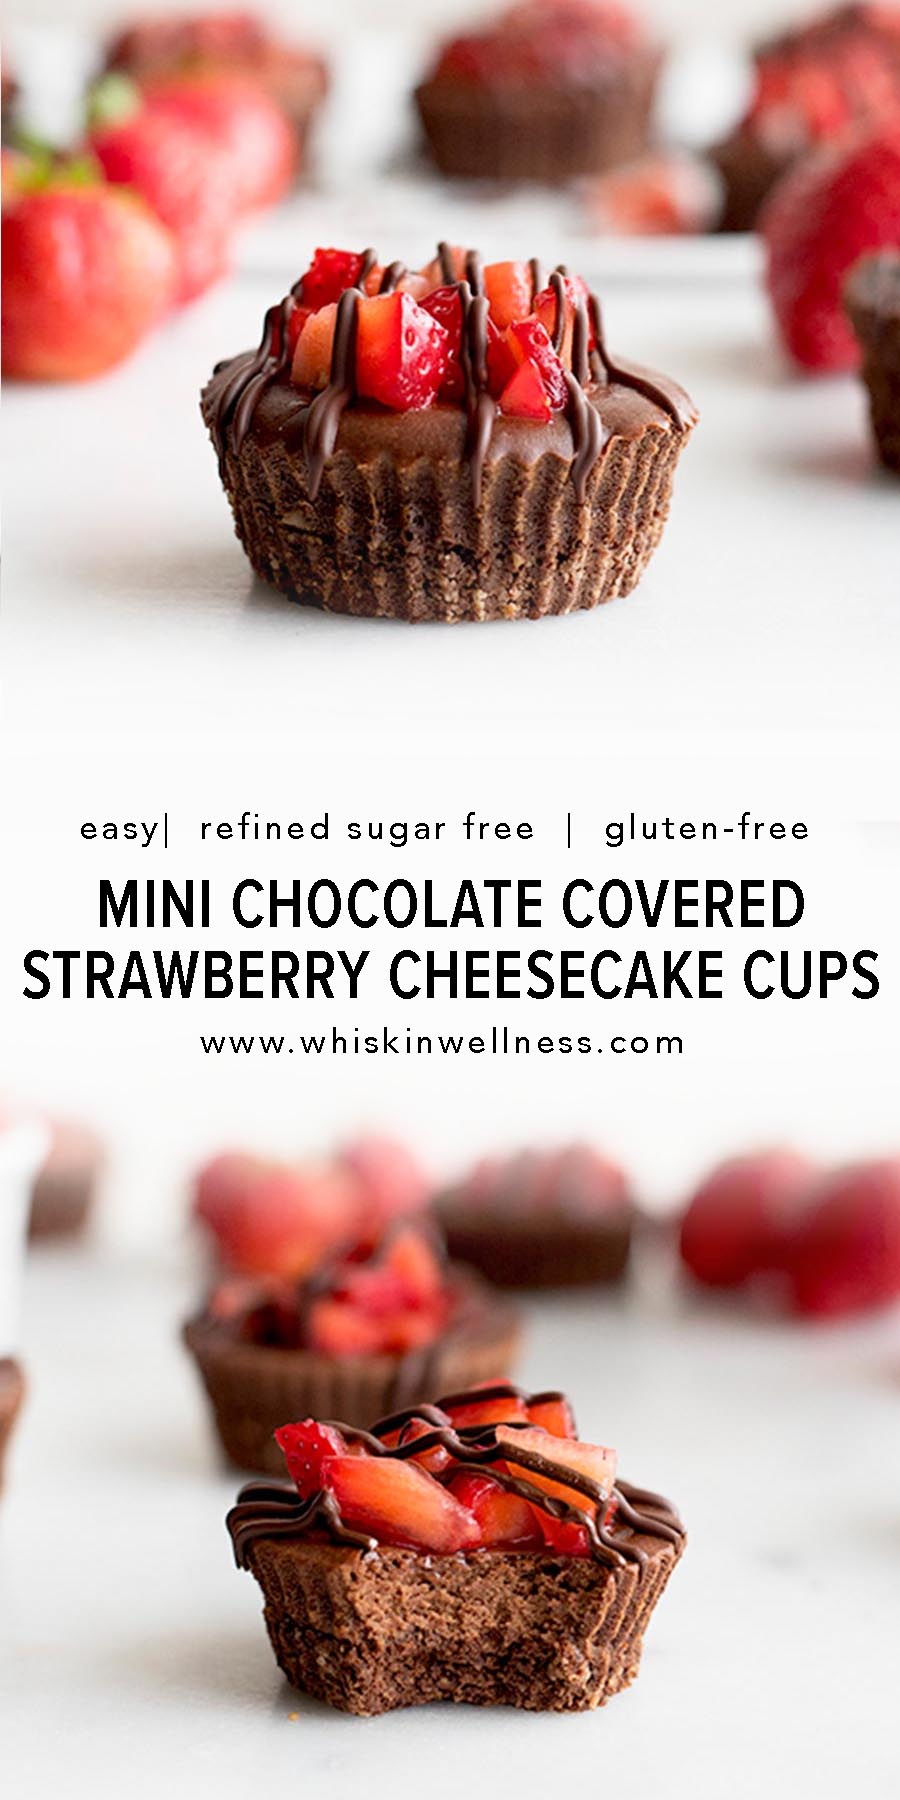 minichocoverestraw.cheesecakecups.wiw .pinterest